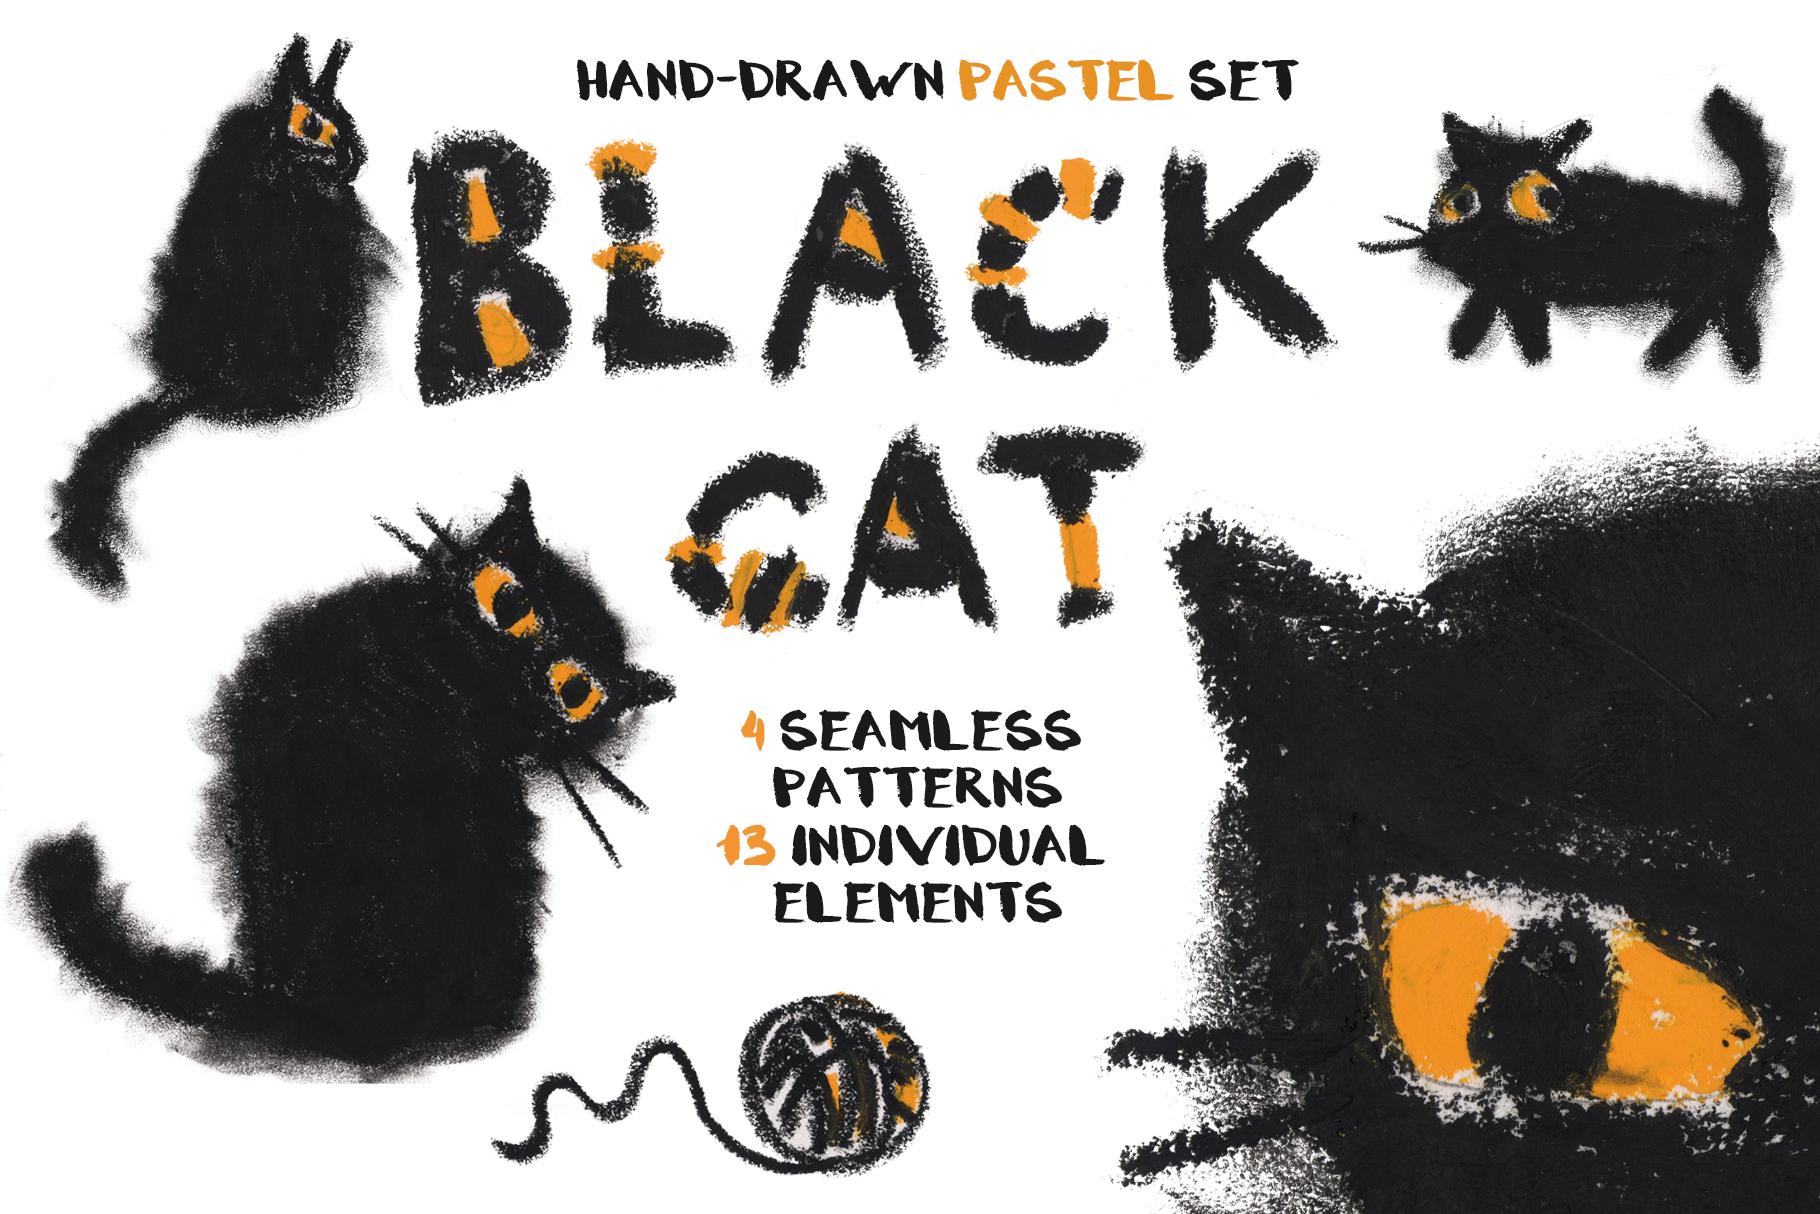 Black cat hand-drawn pastel set example image 1